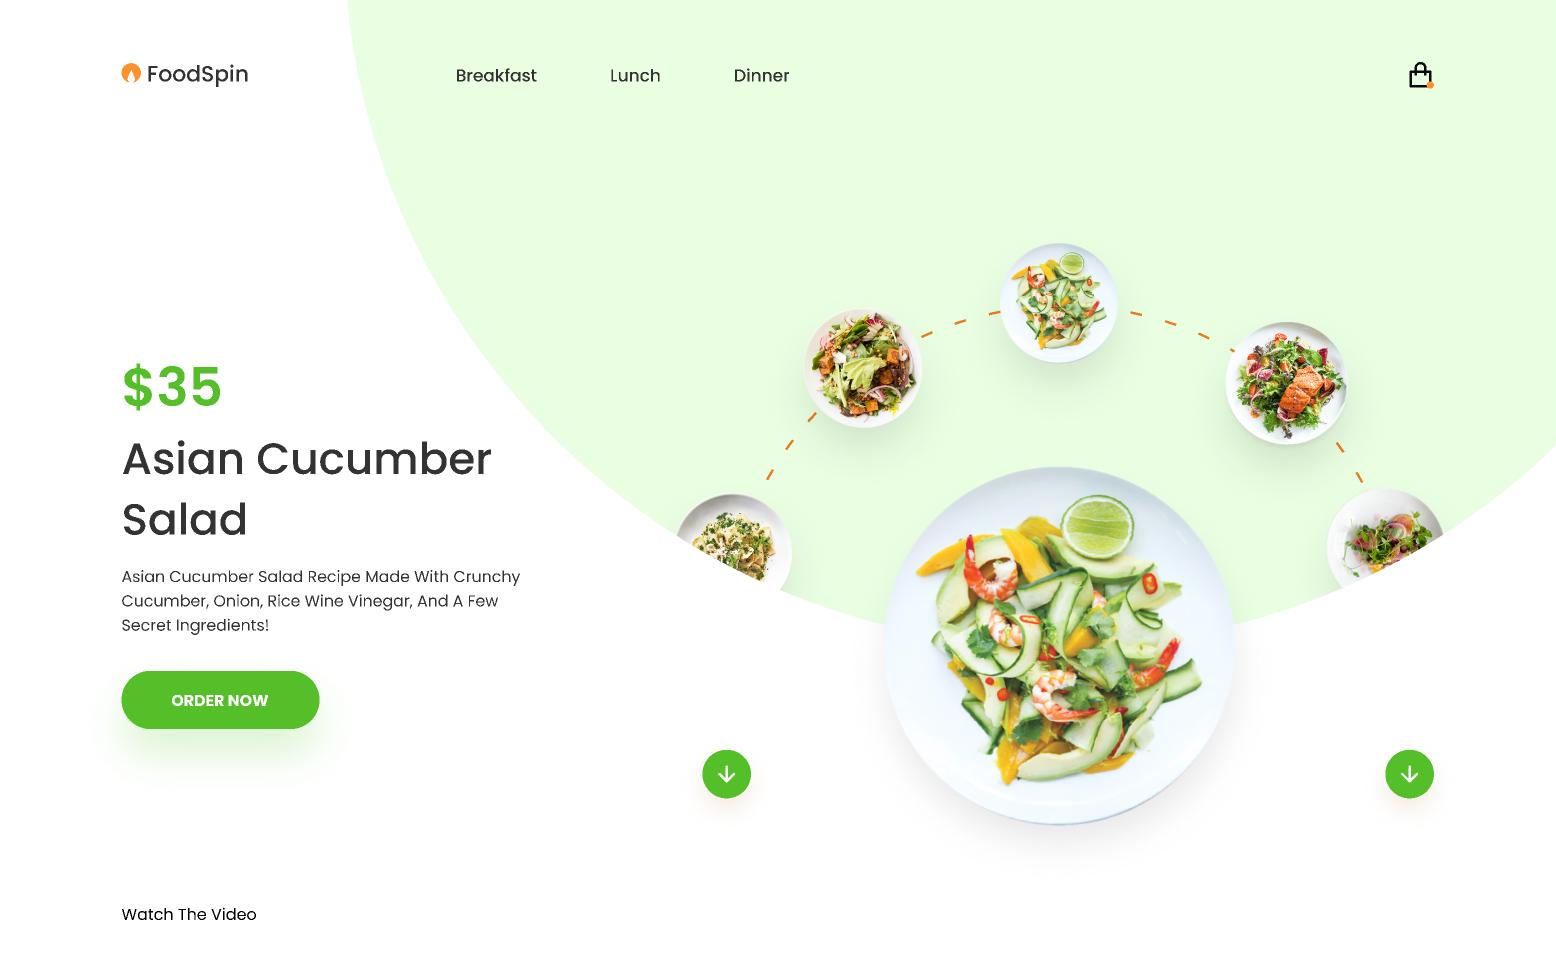 FoodSpin interaction